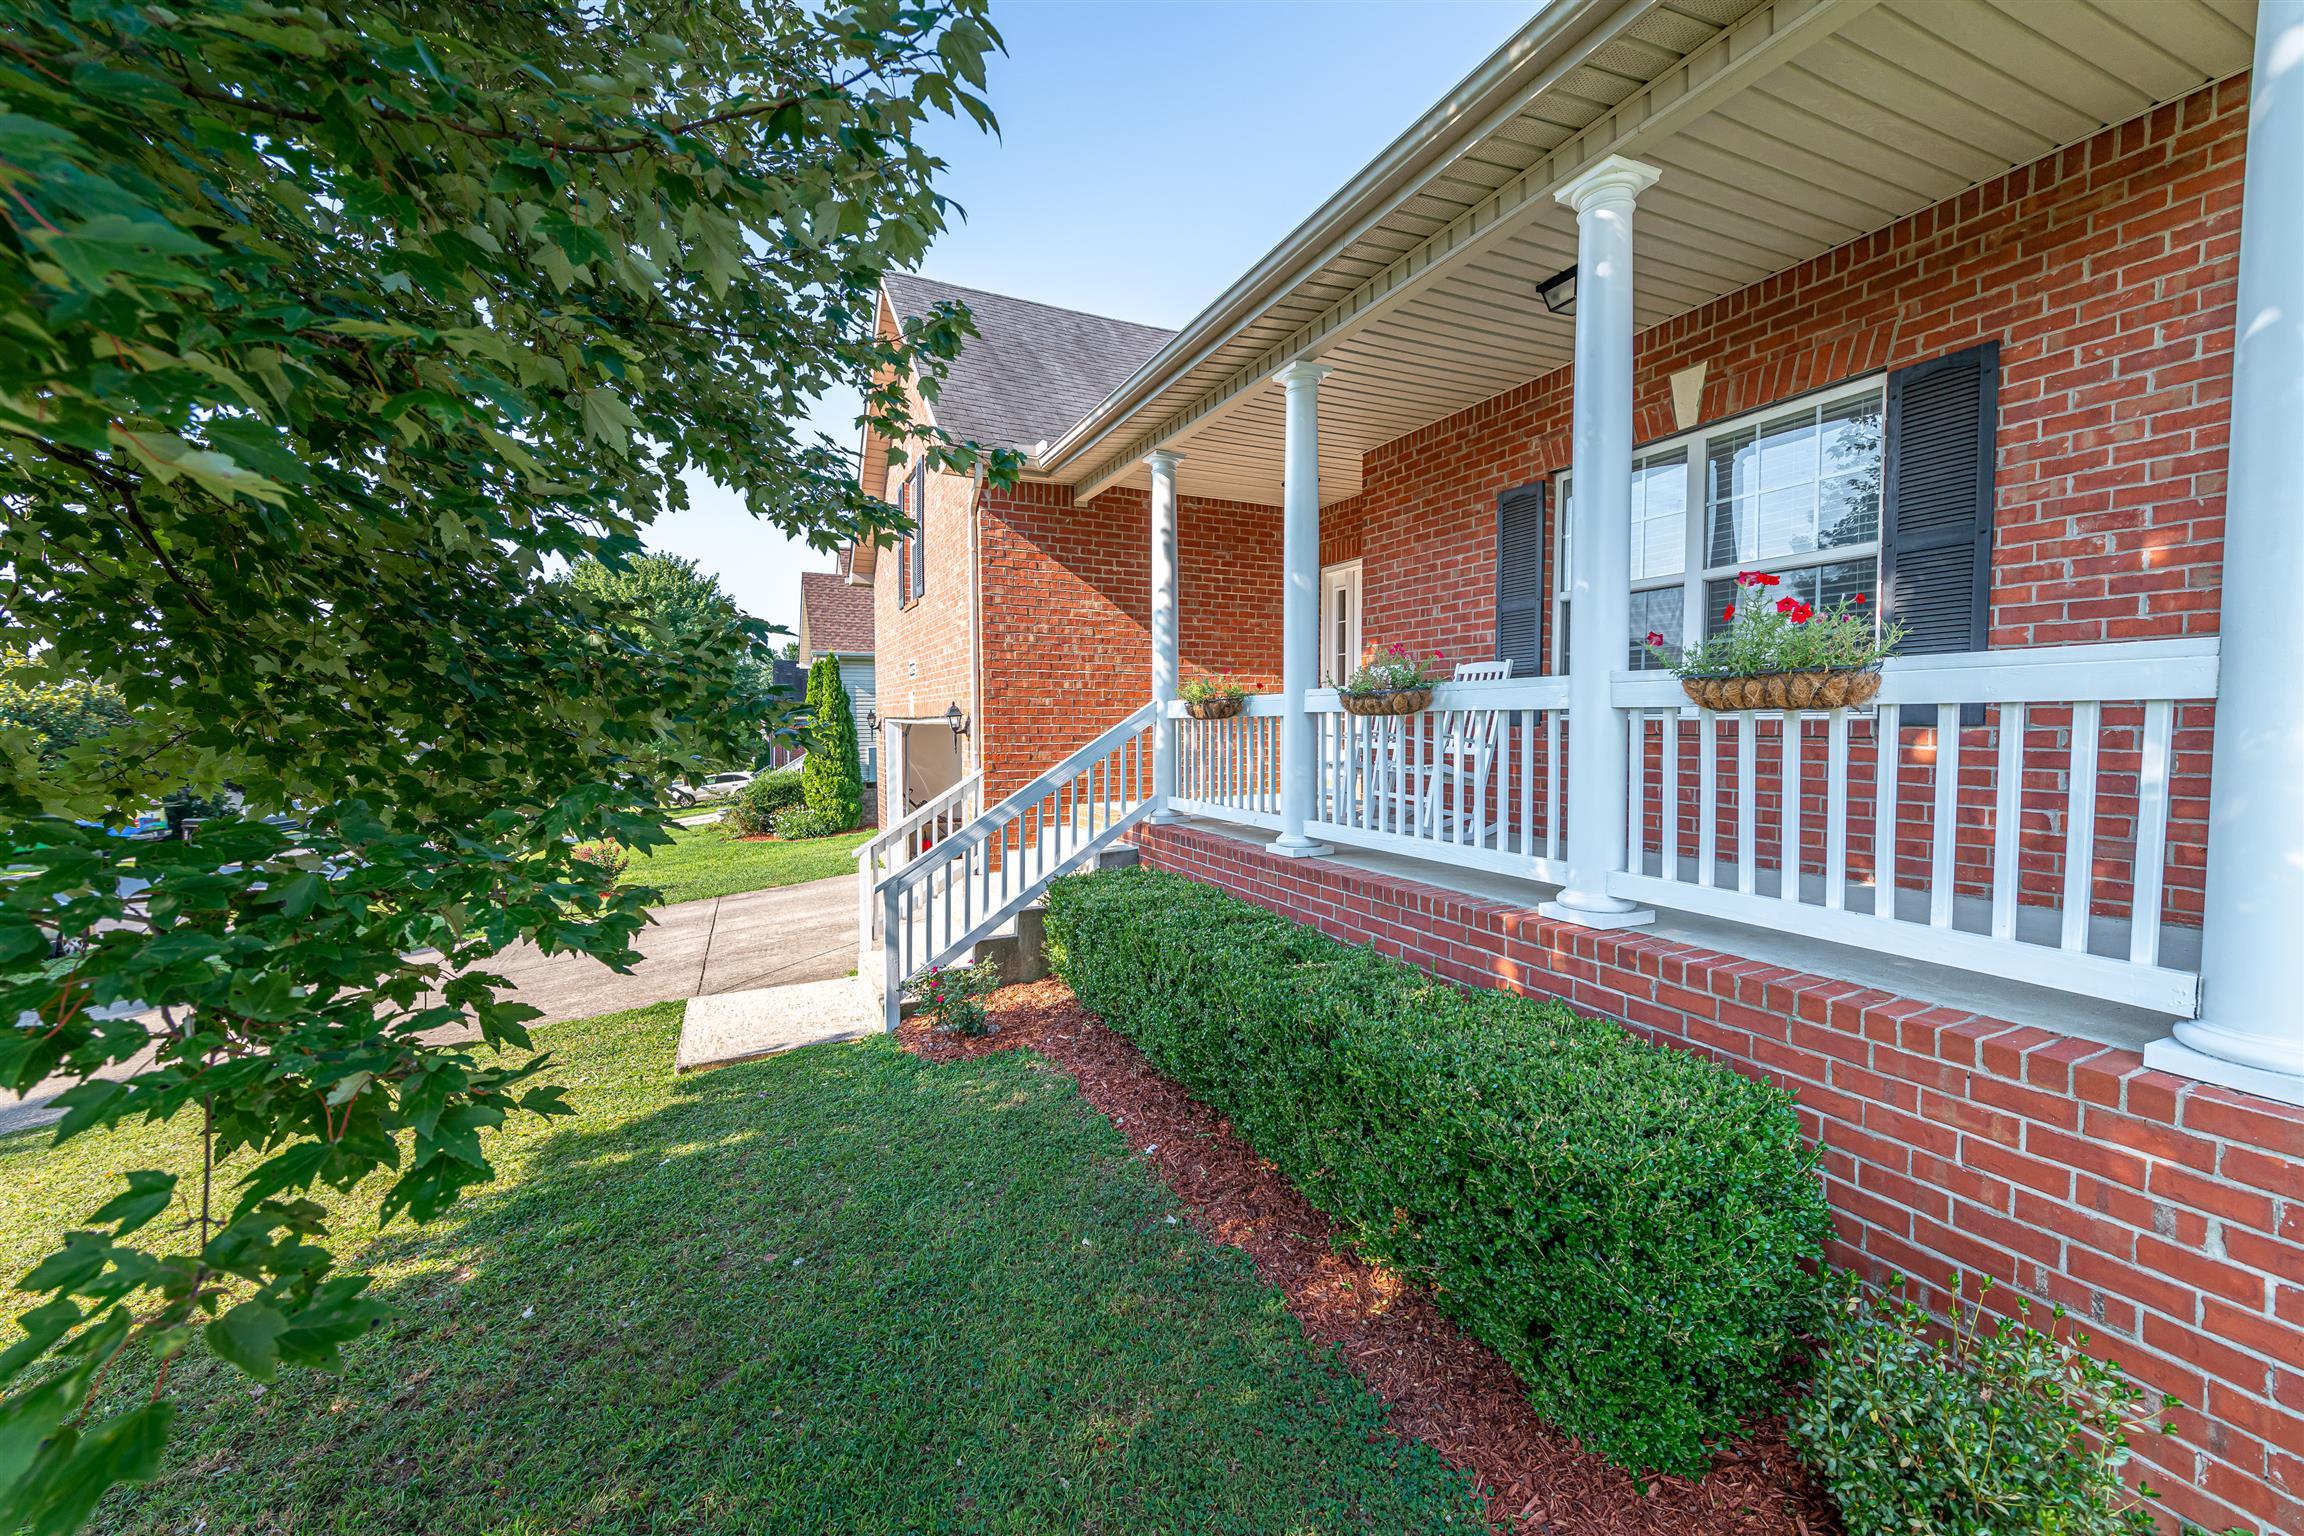 4002 Gersham Ct, Spring Hill, TN 37174 - Spring Hill, TN real estate listing